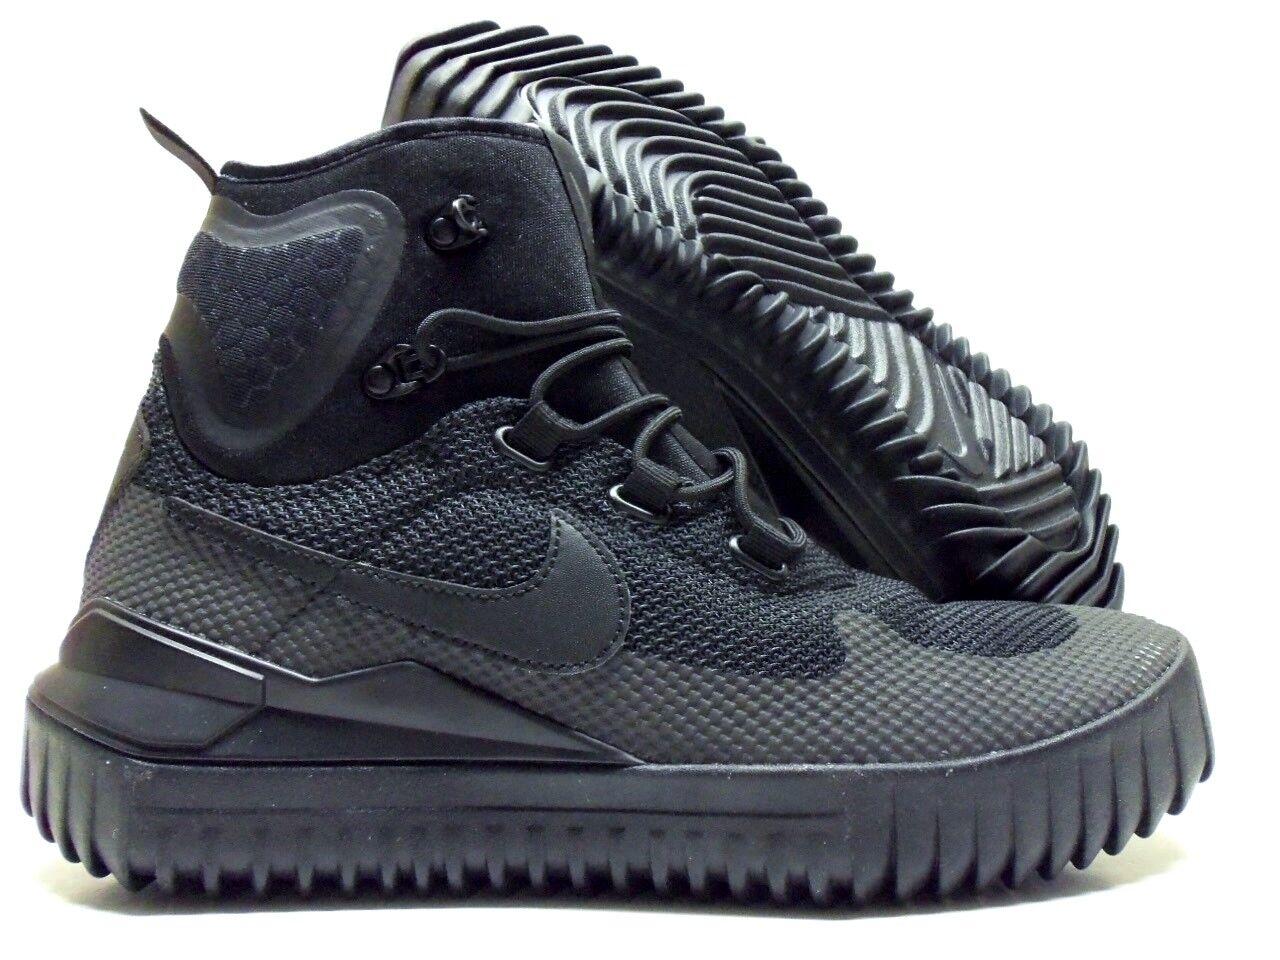 Nike air wild metà lustrascarpe dimensioni / nero-anthracite dimensioni lustrascarpe uomini. df78b4